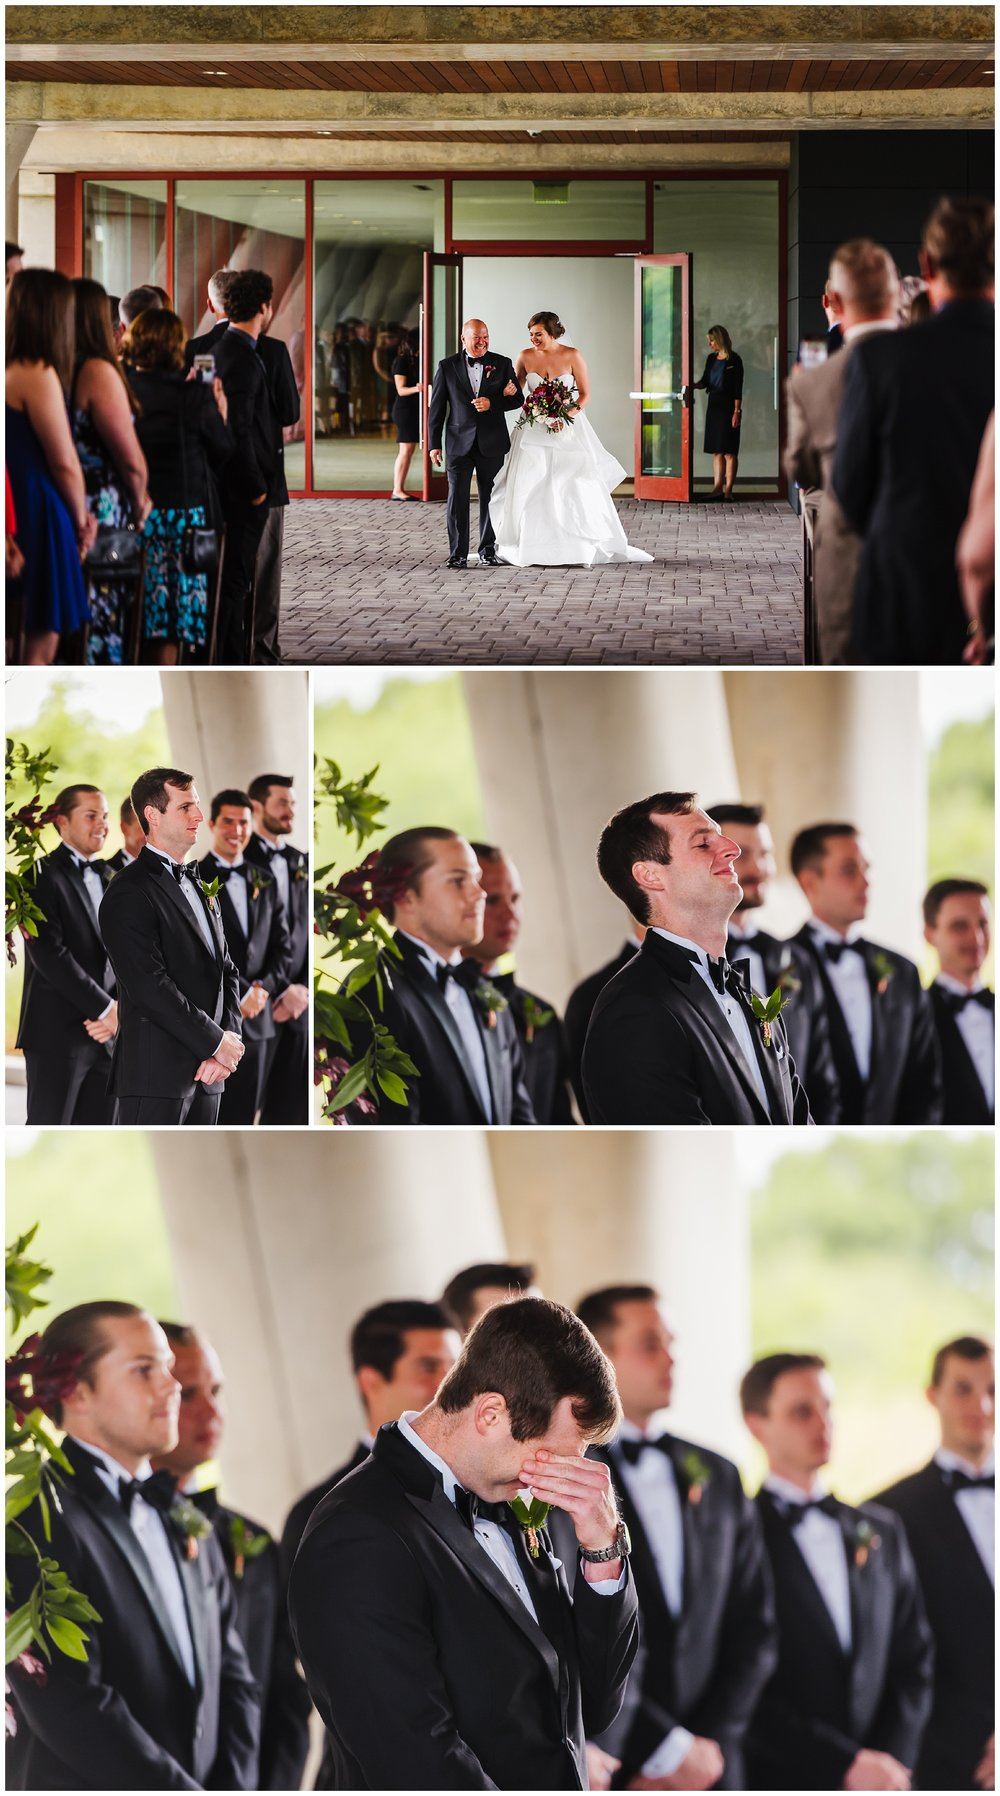 Tampa-streamsong-wedding-photographer-golf-resort-navy-blue-peonie_0070.jpg